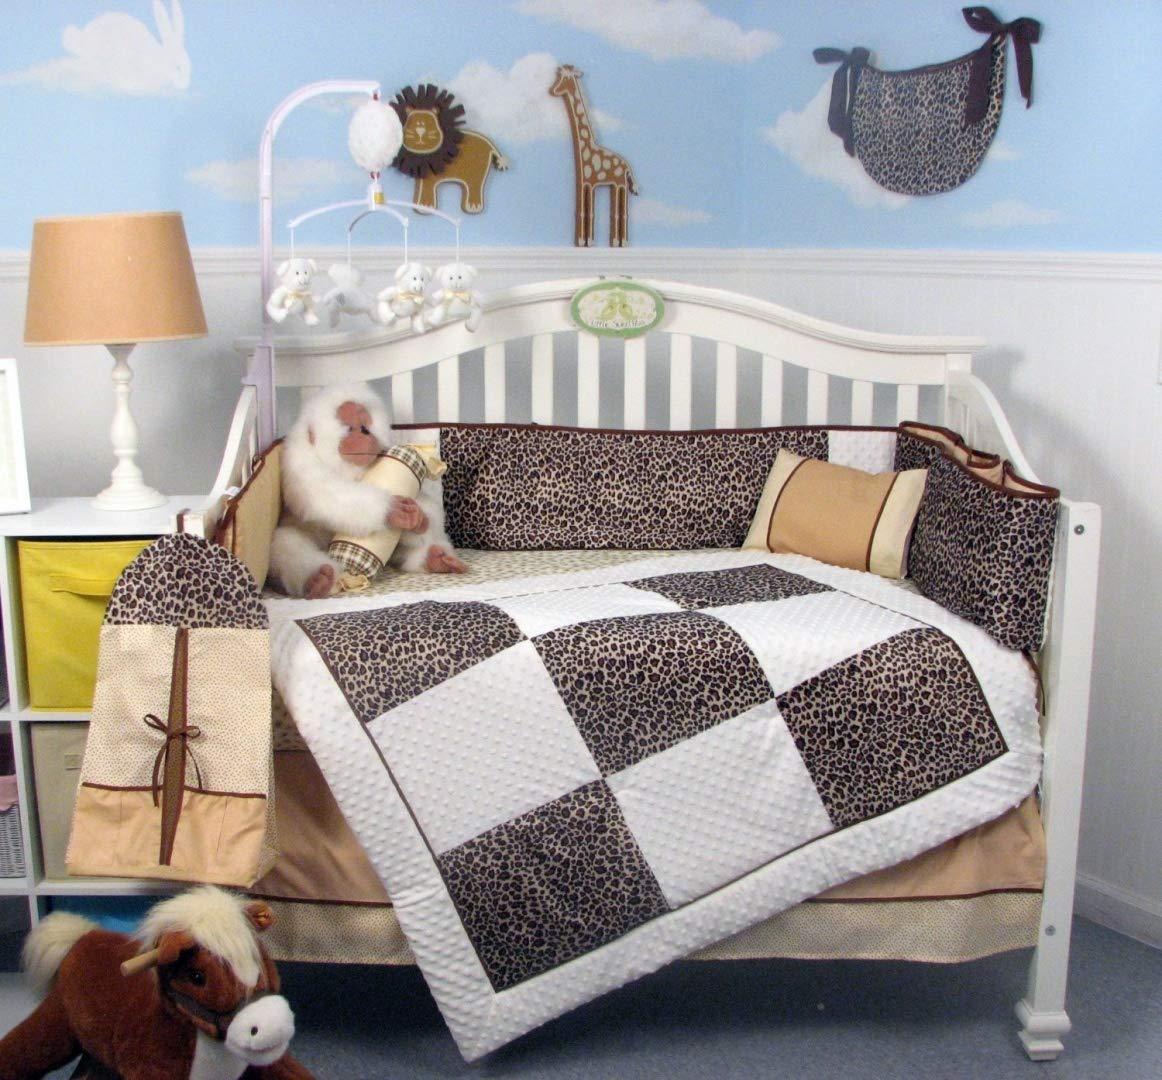 Soho White Chenille & Giraffe Minky Baby Crib Nursery Bedding Set 14 Pcs Included Diaper Bag with Changing Pad & Bottle Case by SoHo Designs   B00FH4EBK4